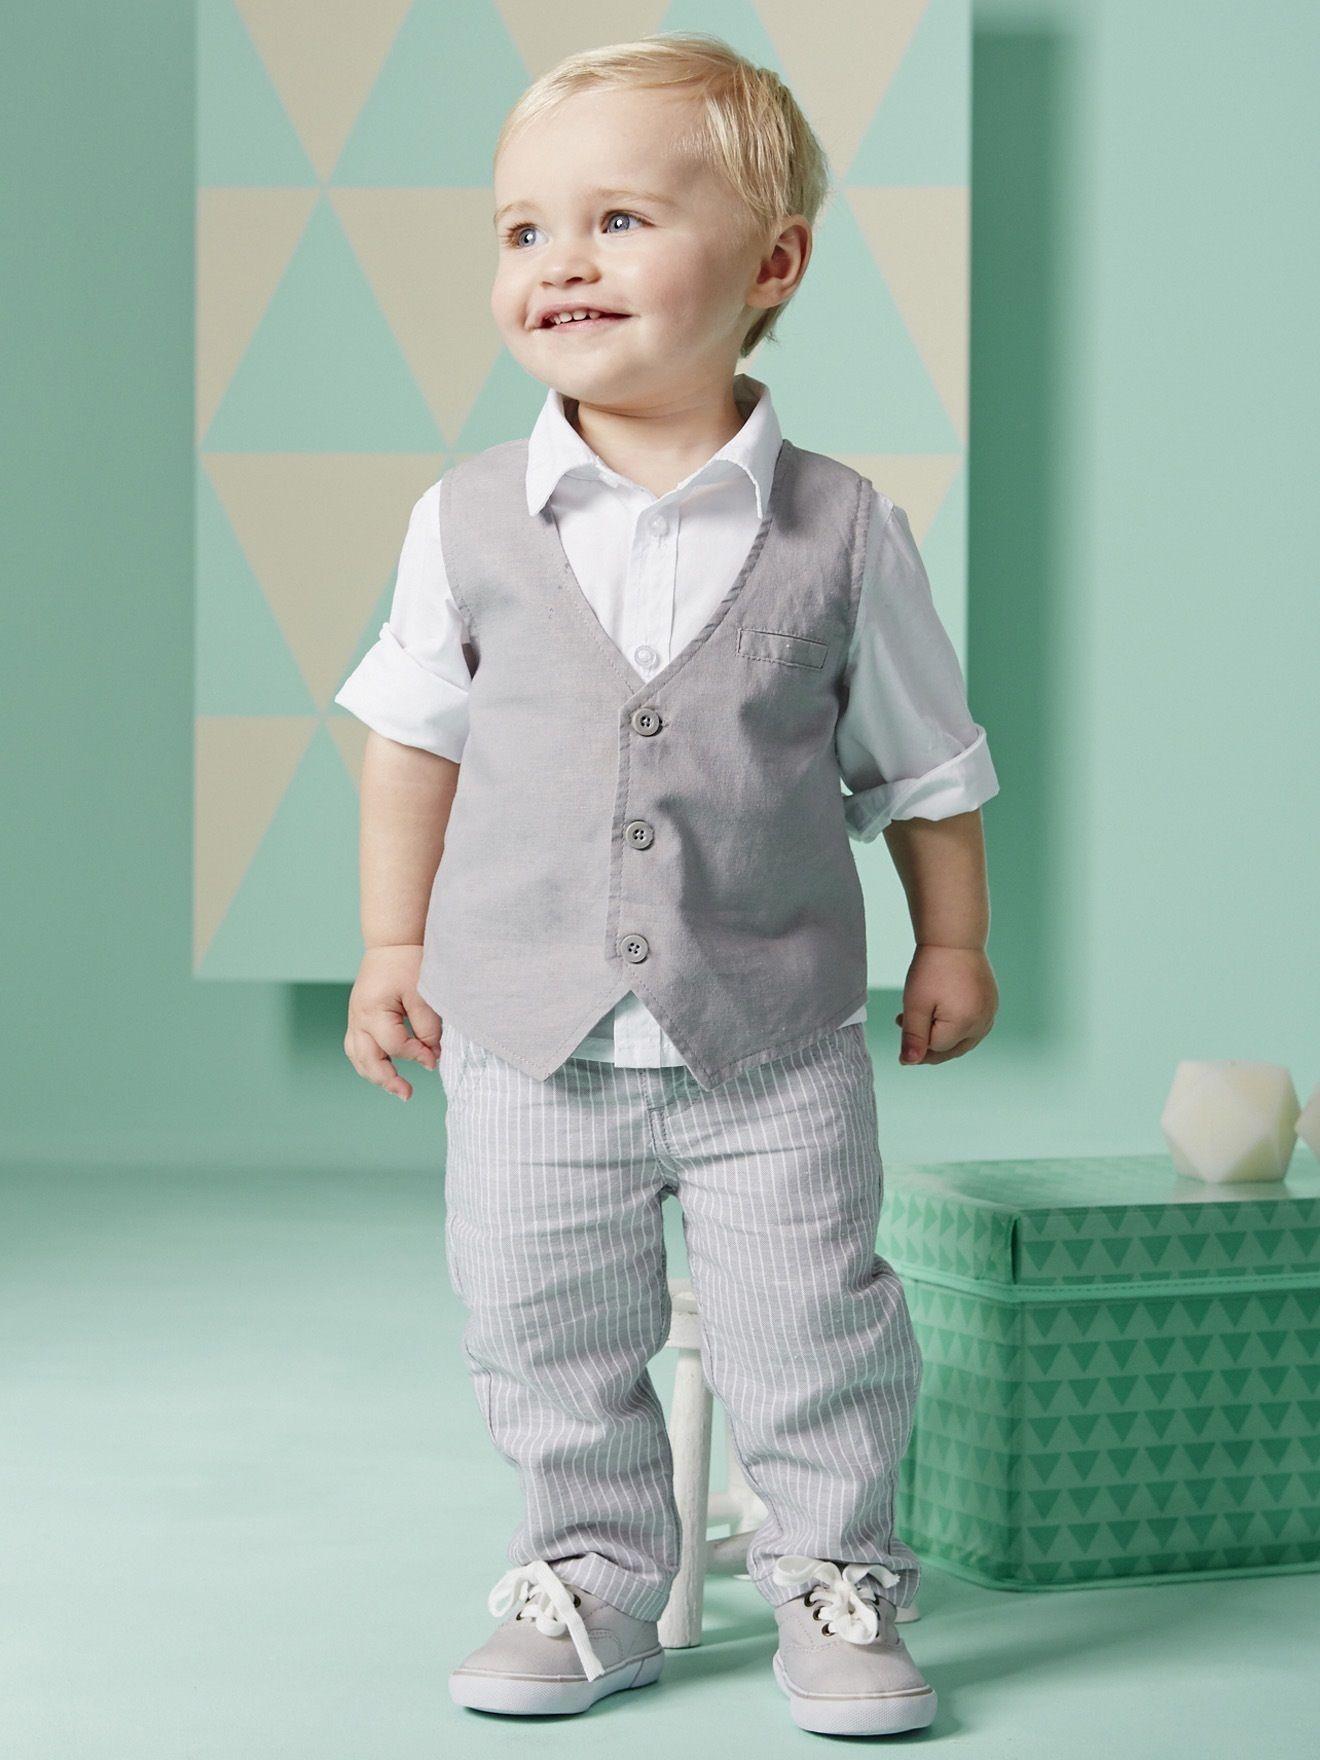 2016 Nuovo Ragazzo Imposta Camicie Manica Lunga Pantaloni Gilet 3 Pz Set Boy Gentleman Set baby boy gilet set tre pezzi vestito a strisce